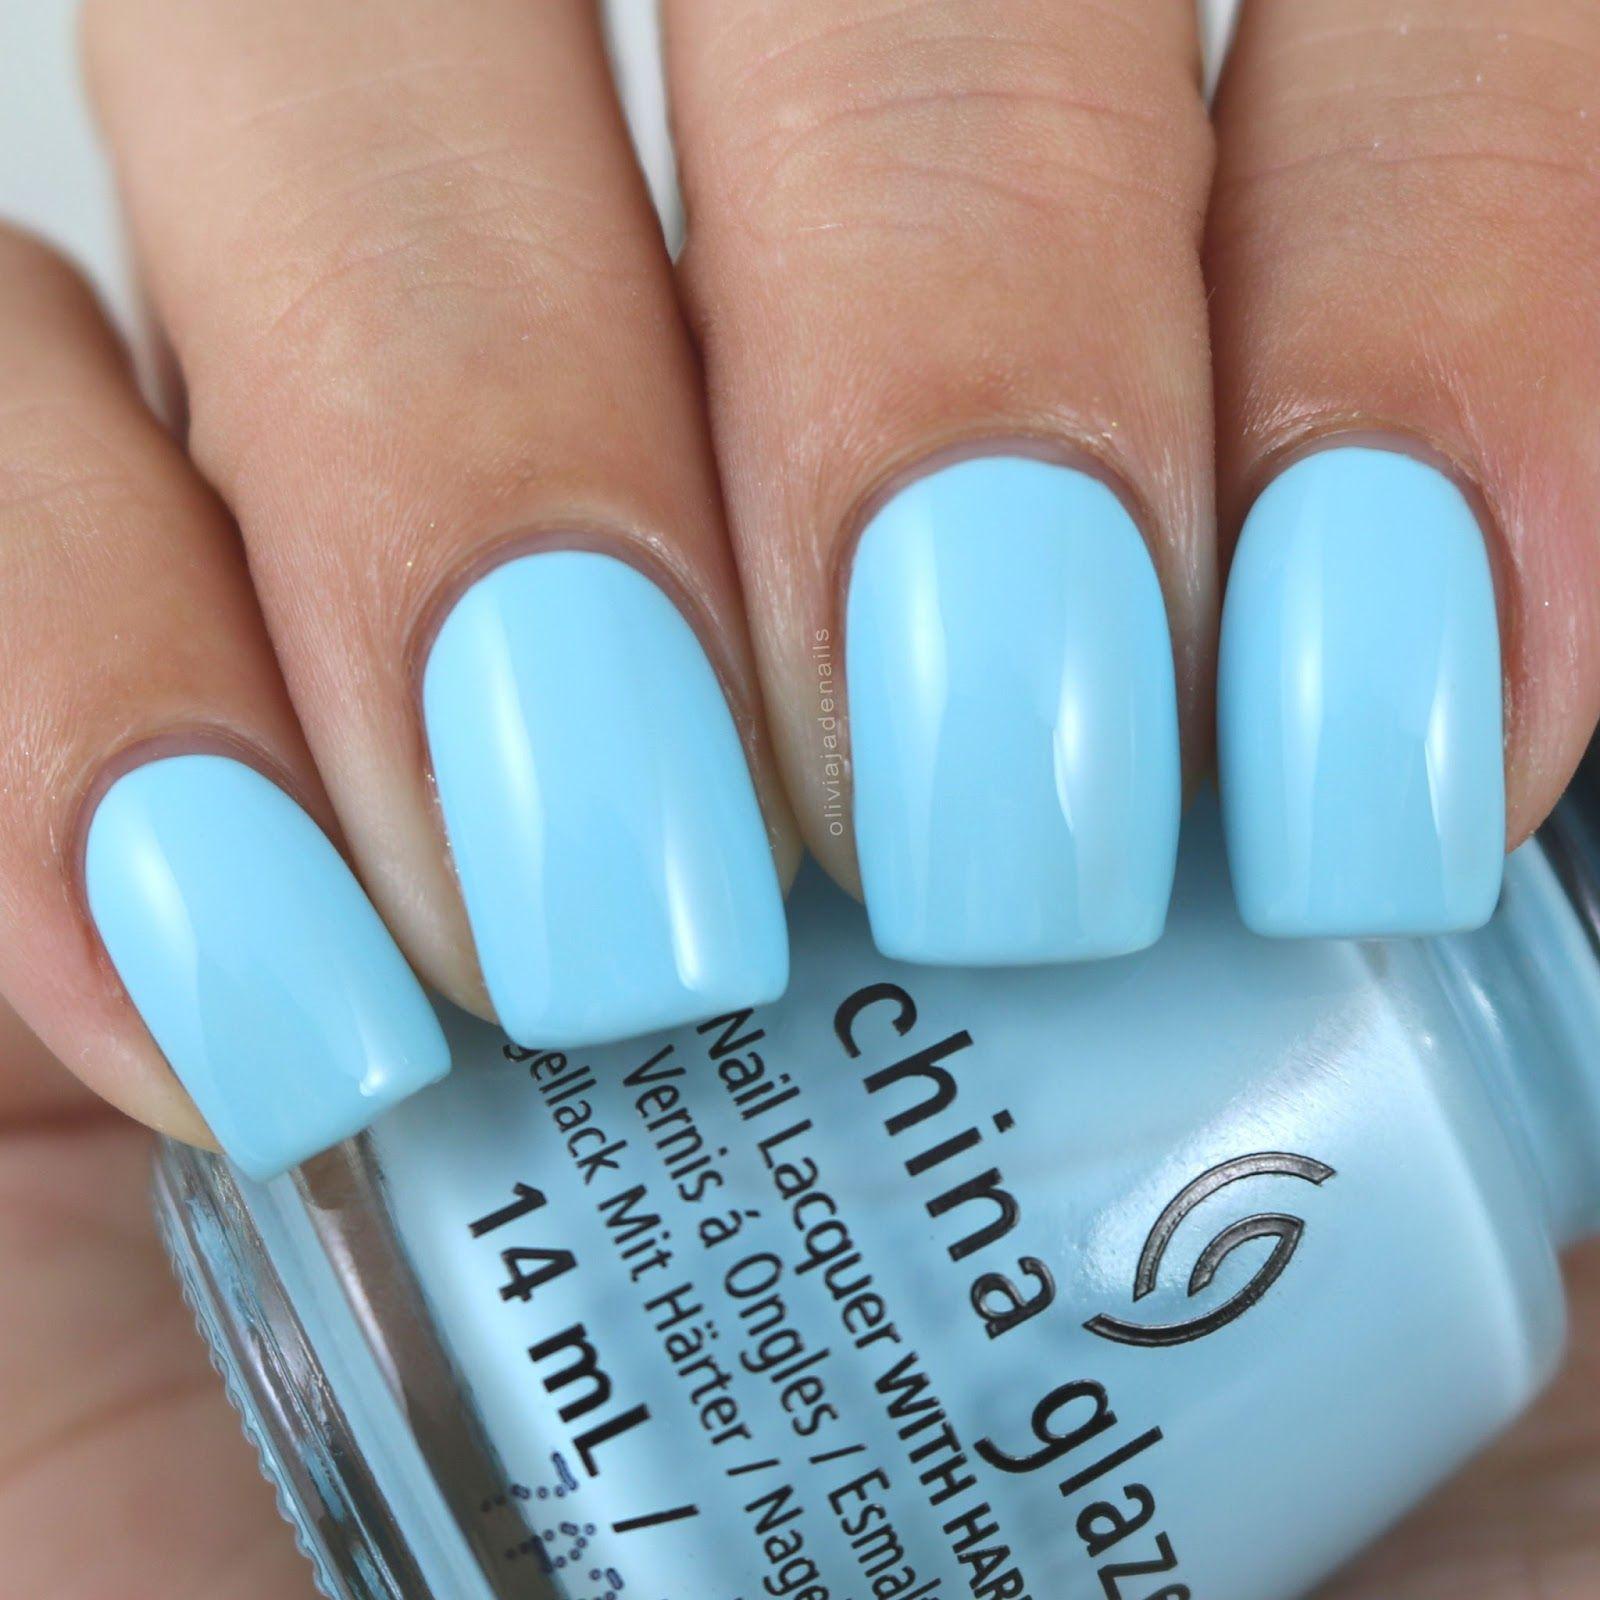 China Glaze Chalk Me Up! swatched by Olivia Jade Nails | Nails ...